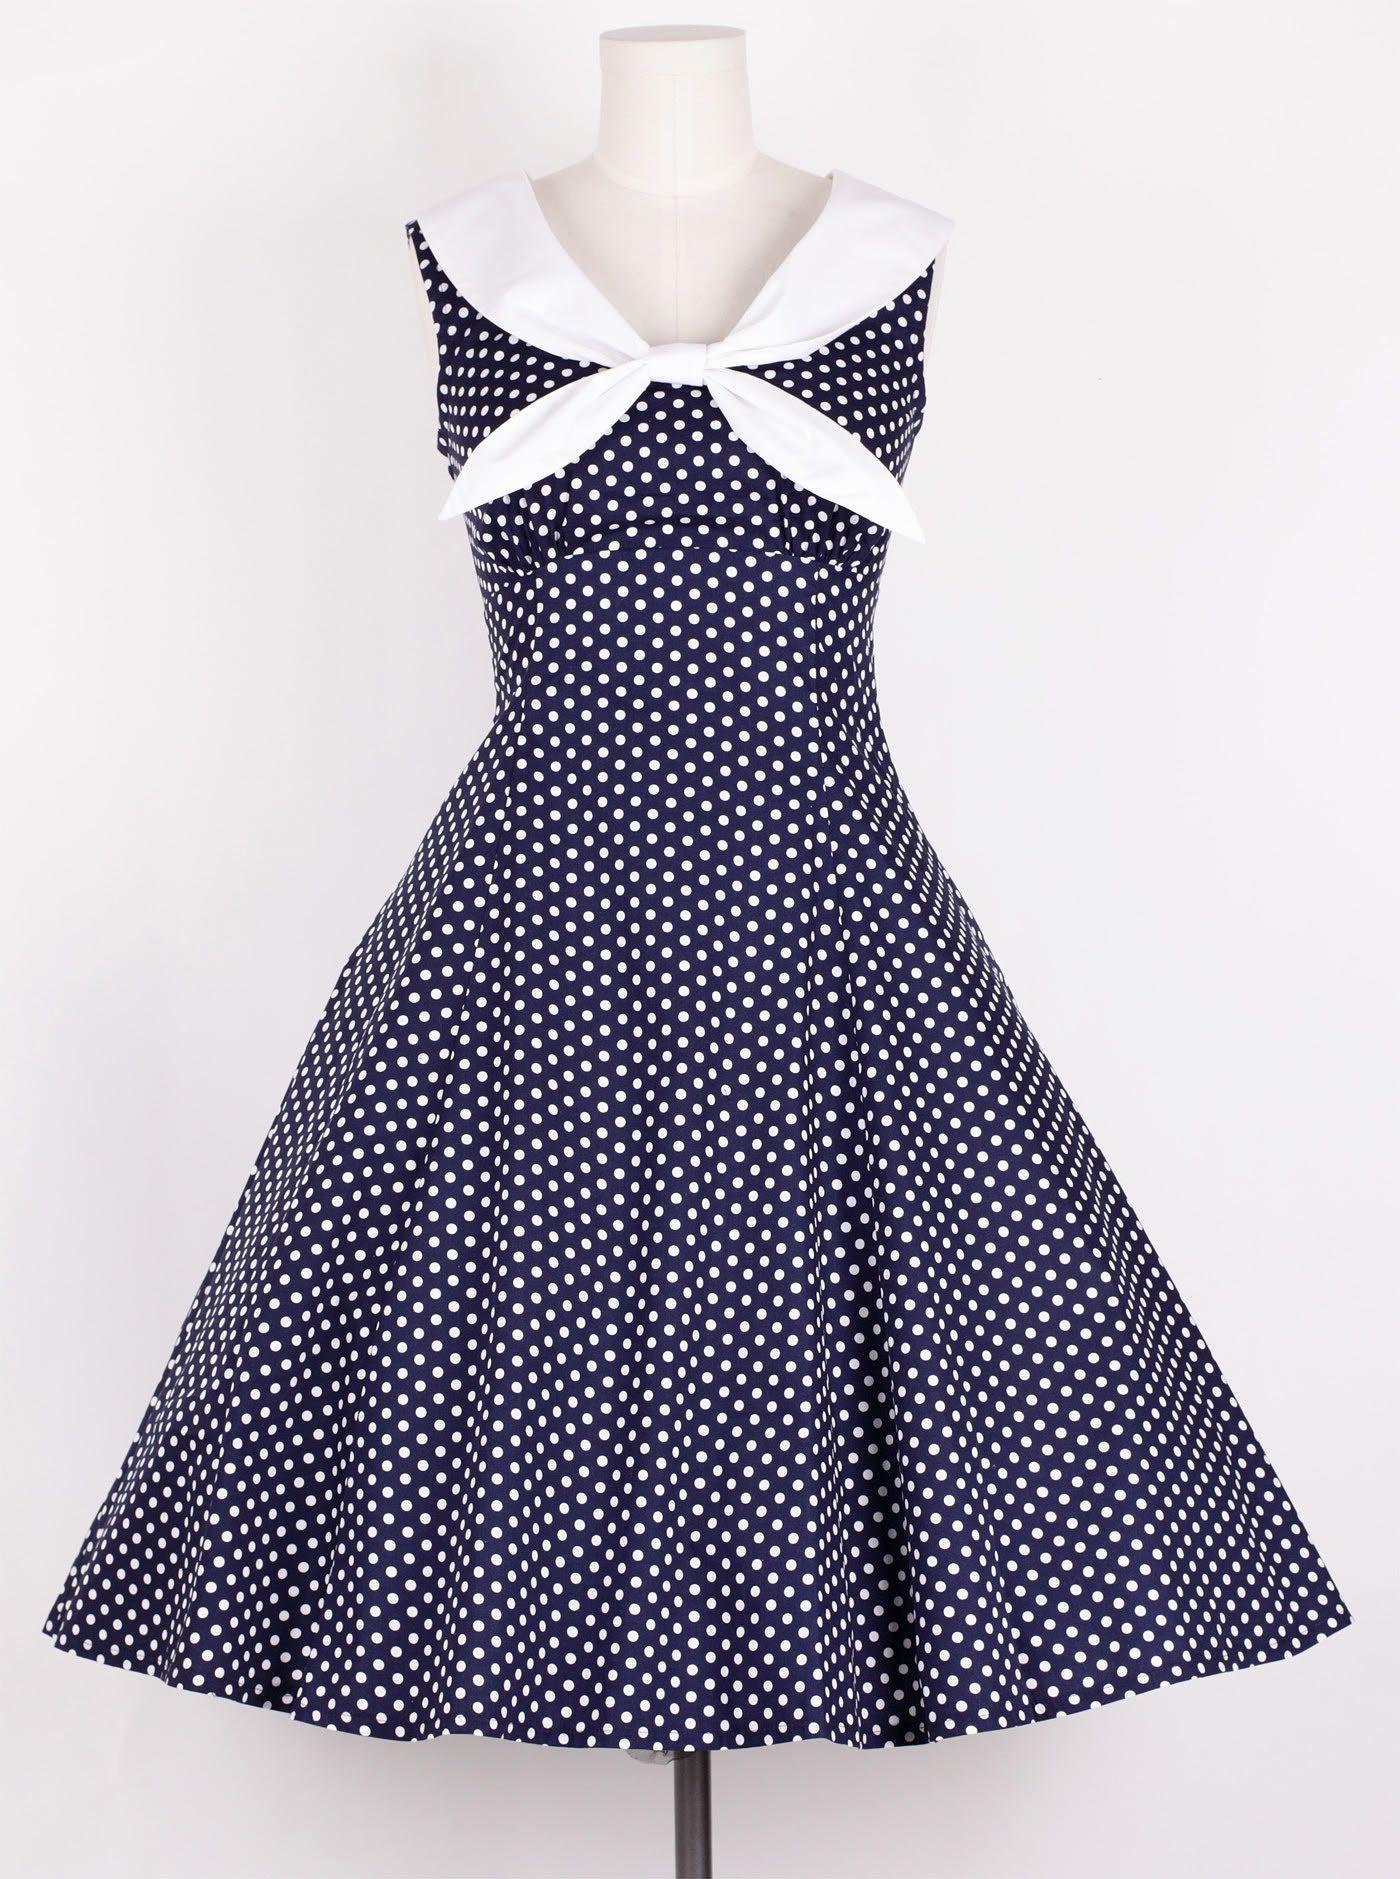 dd9dd14eb286 50s Vintage Size L WhiteDot/Navy Blue Sailor Dress Polka Dot ...